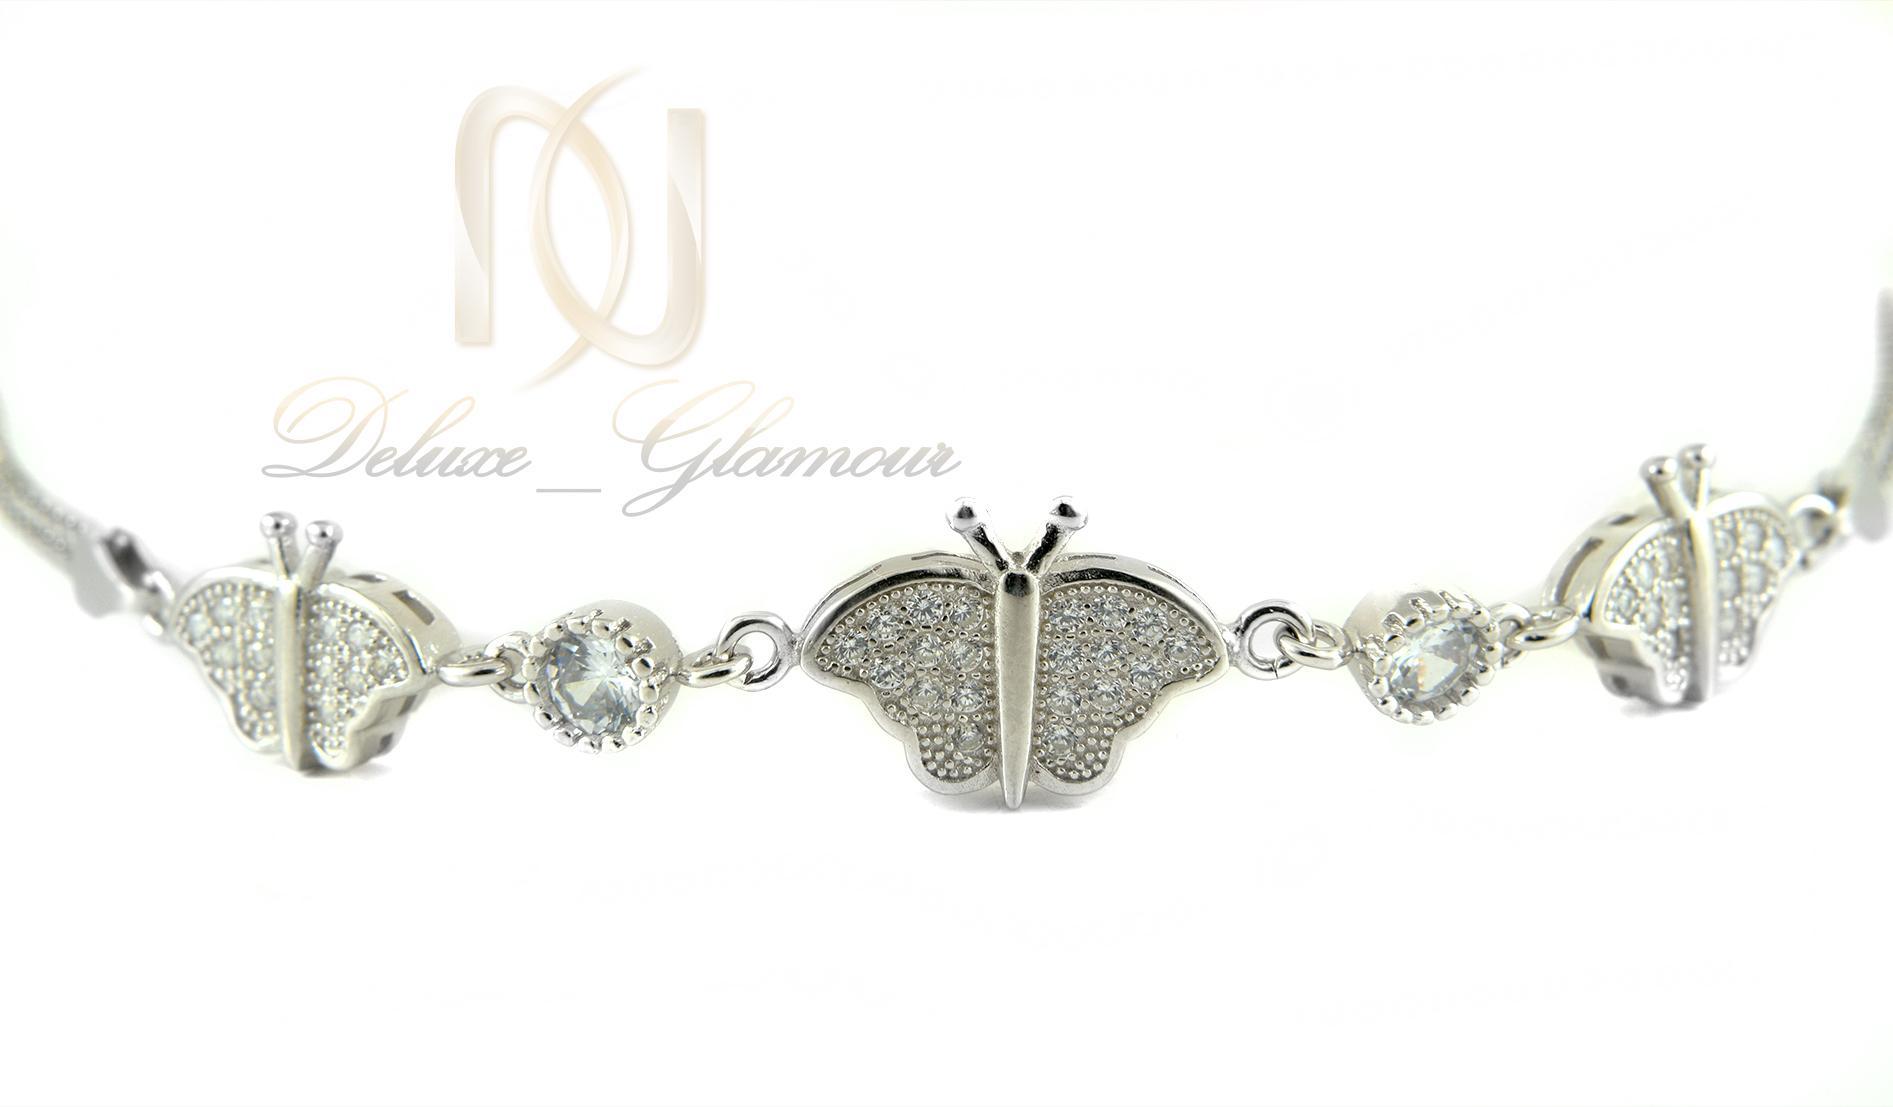 دستبند دخترانه نقره تایلندی ds-n335 (2)